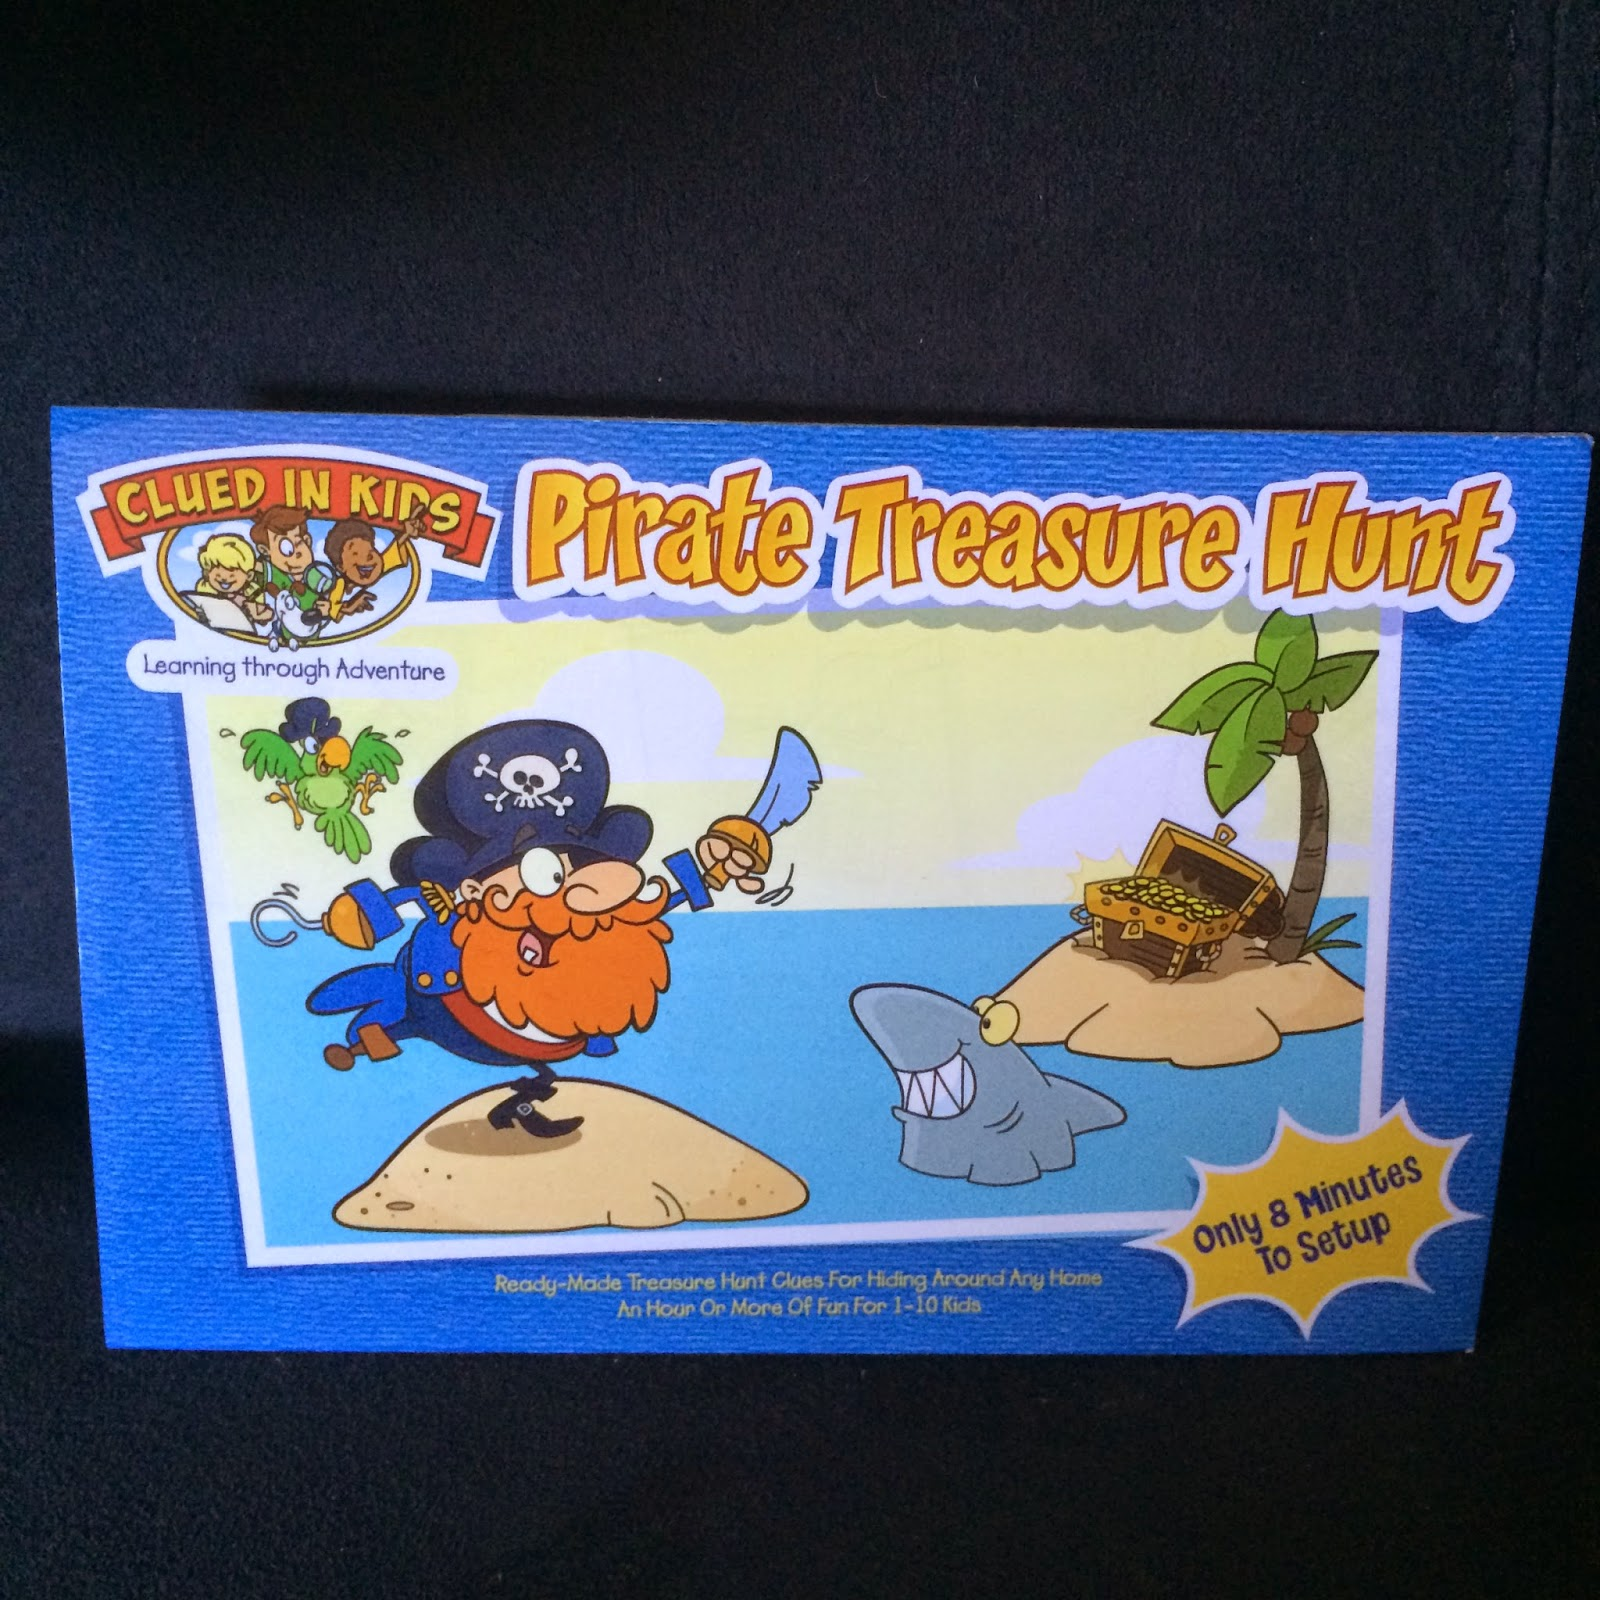 clued in kids pirate treasure hunt #review